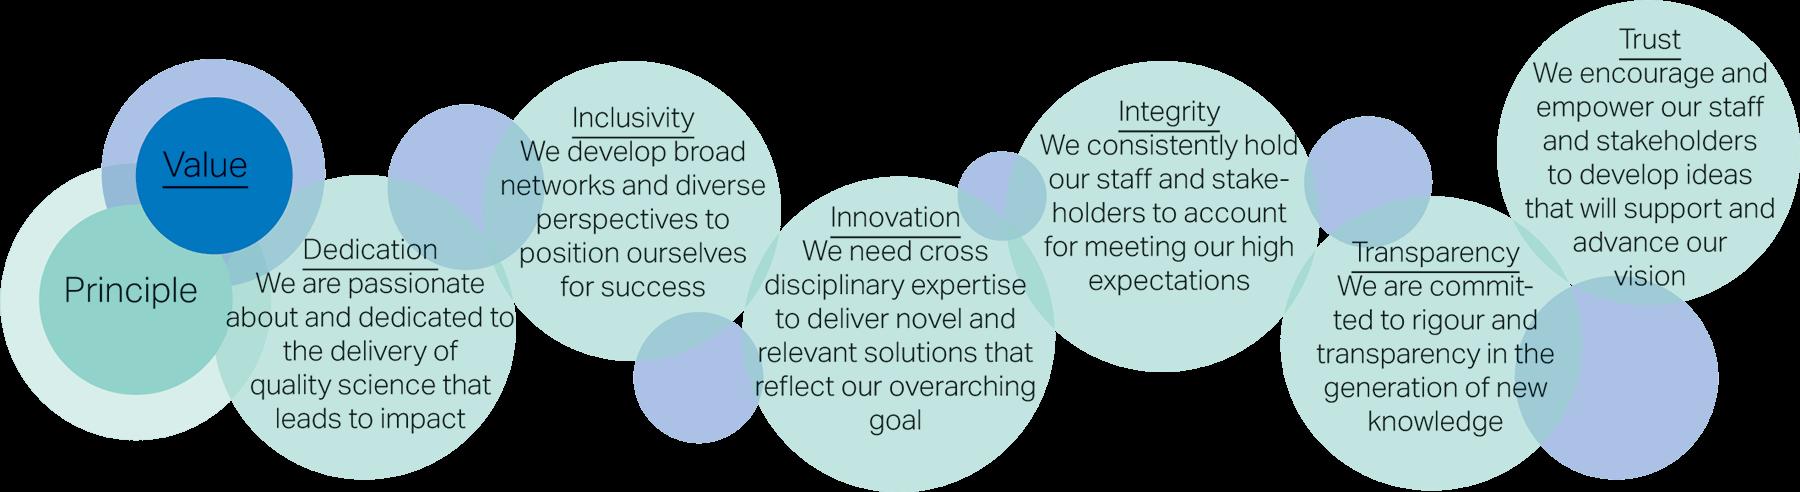 Value and Principle